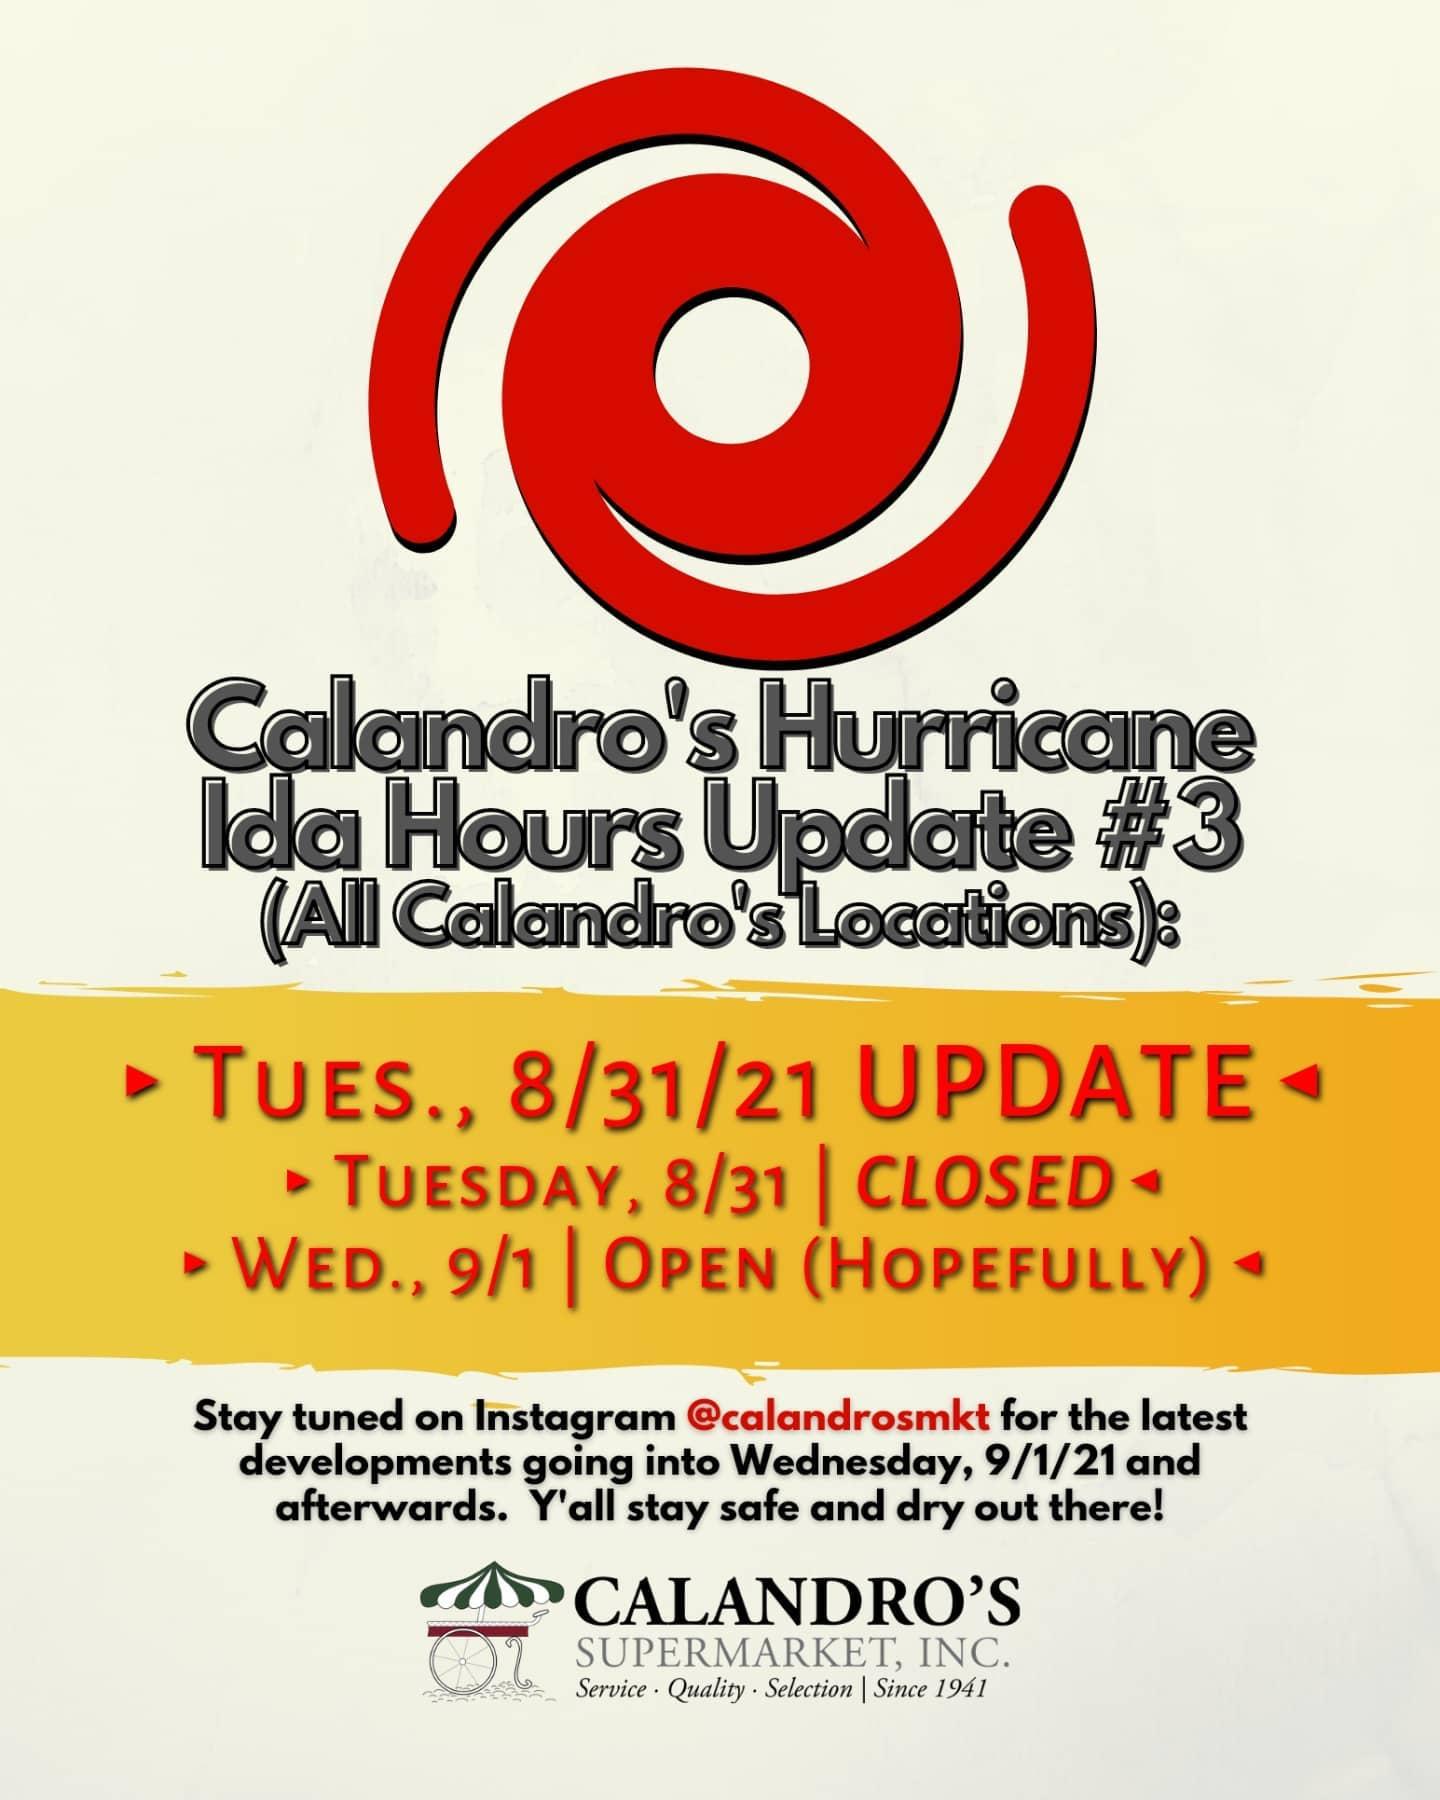 Calandro's Hurricane Ida Store Openings & Hours – Update #3…closed Tuesday, 8/31 – hoping to